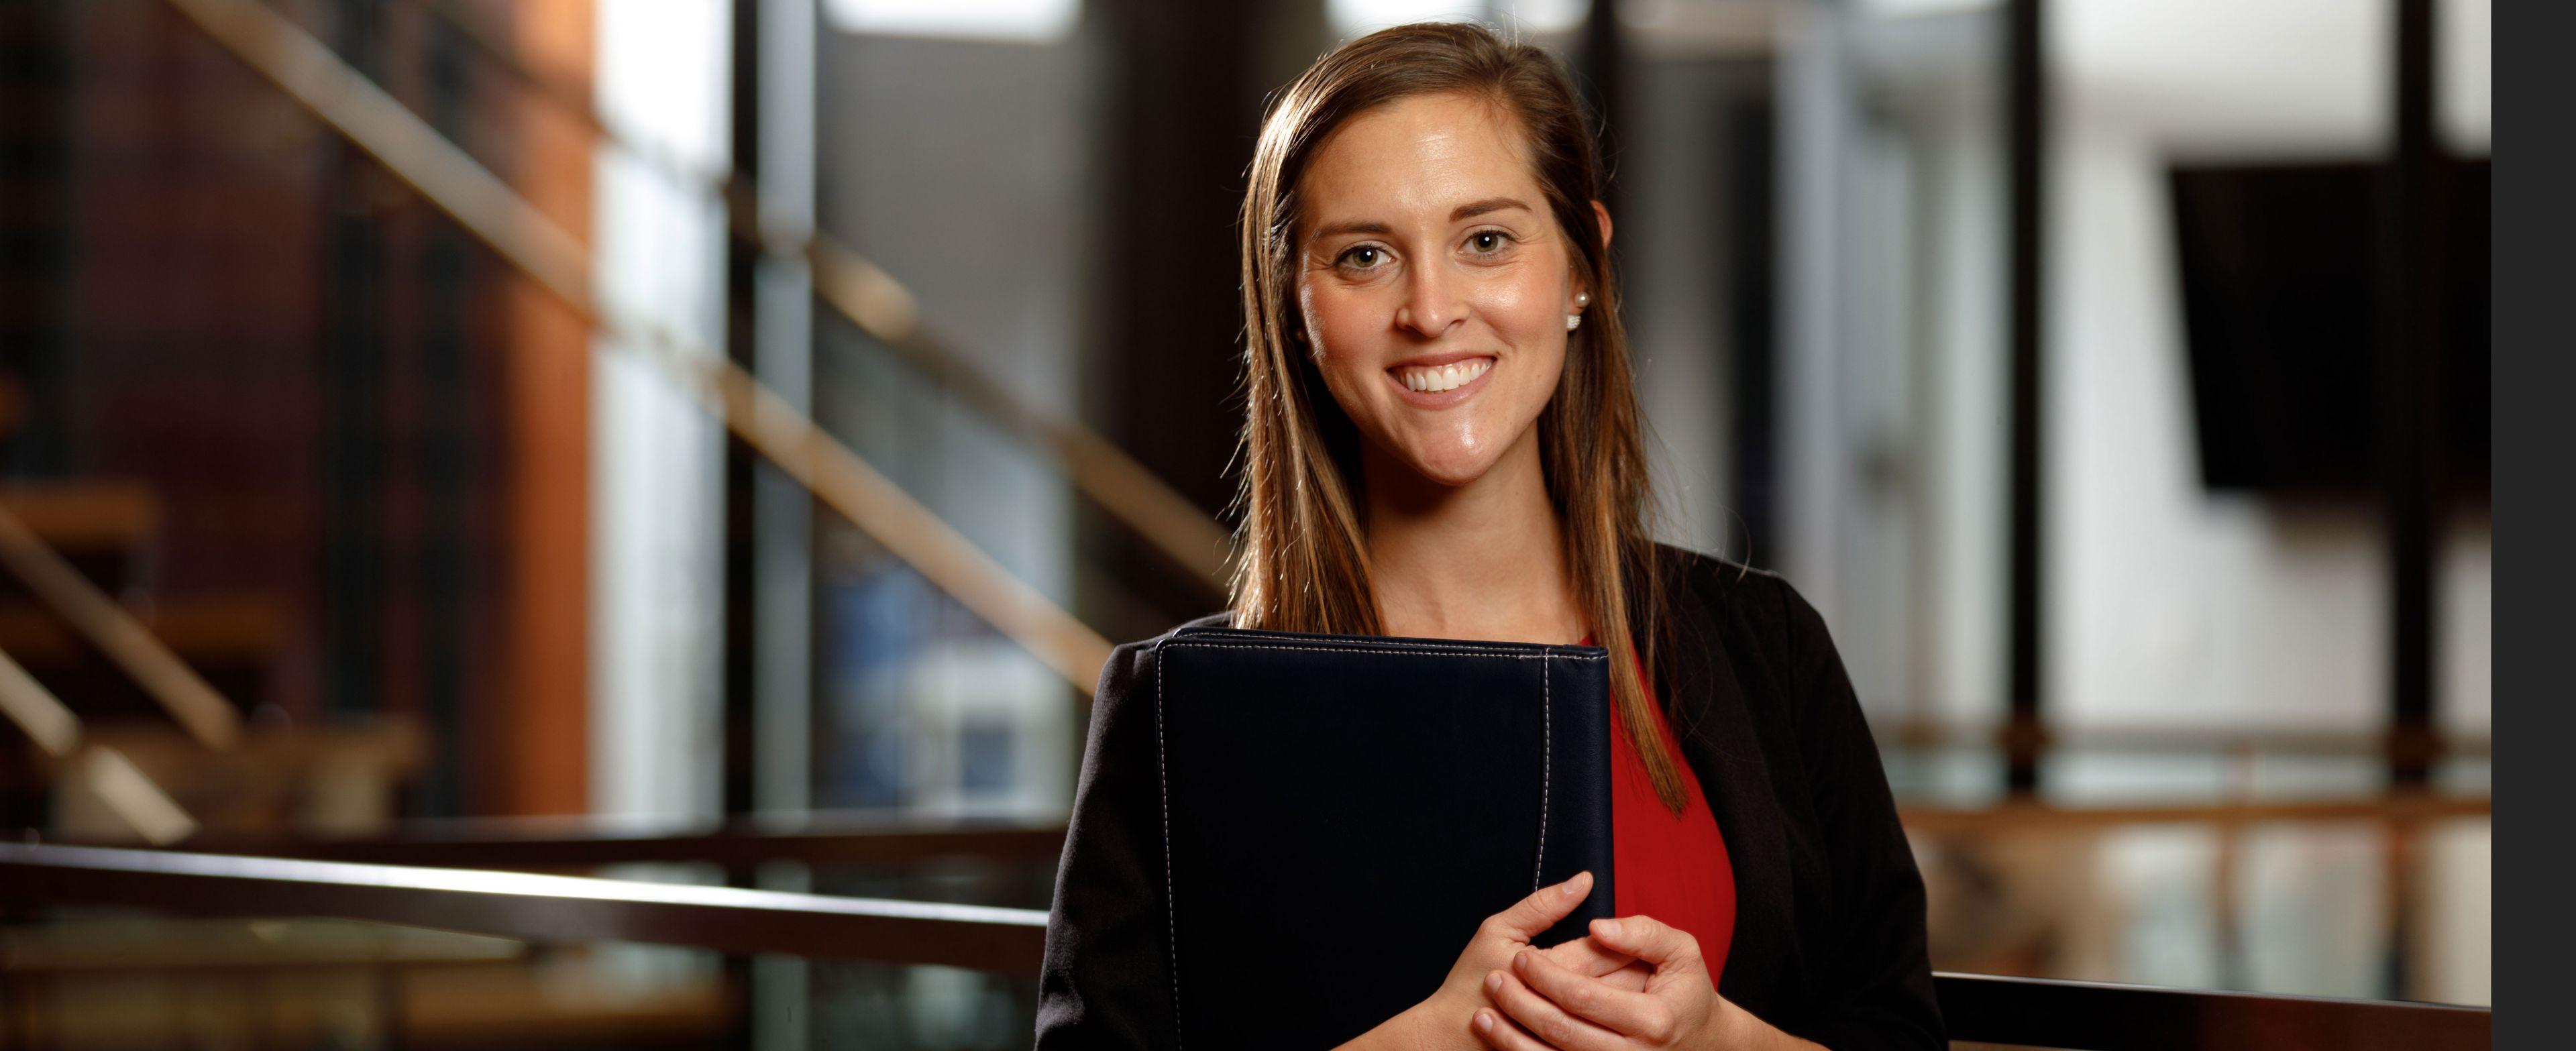 MBA Healthcare Management Online